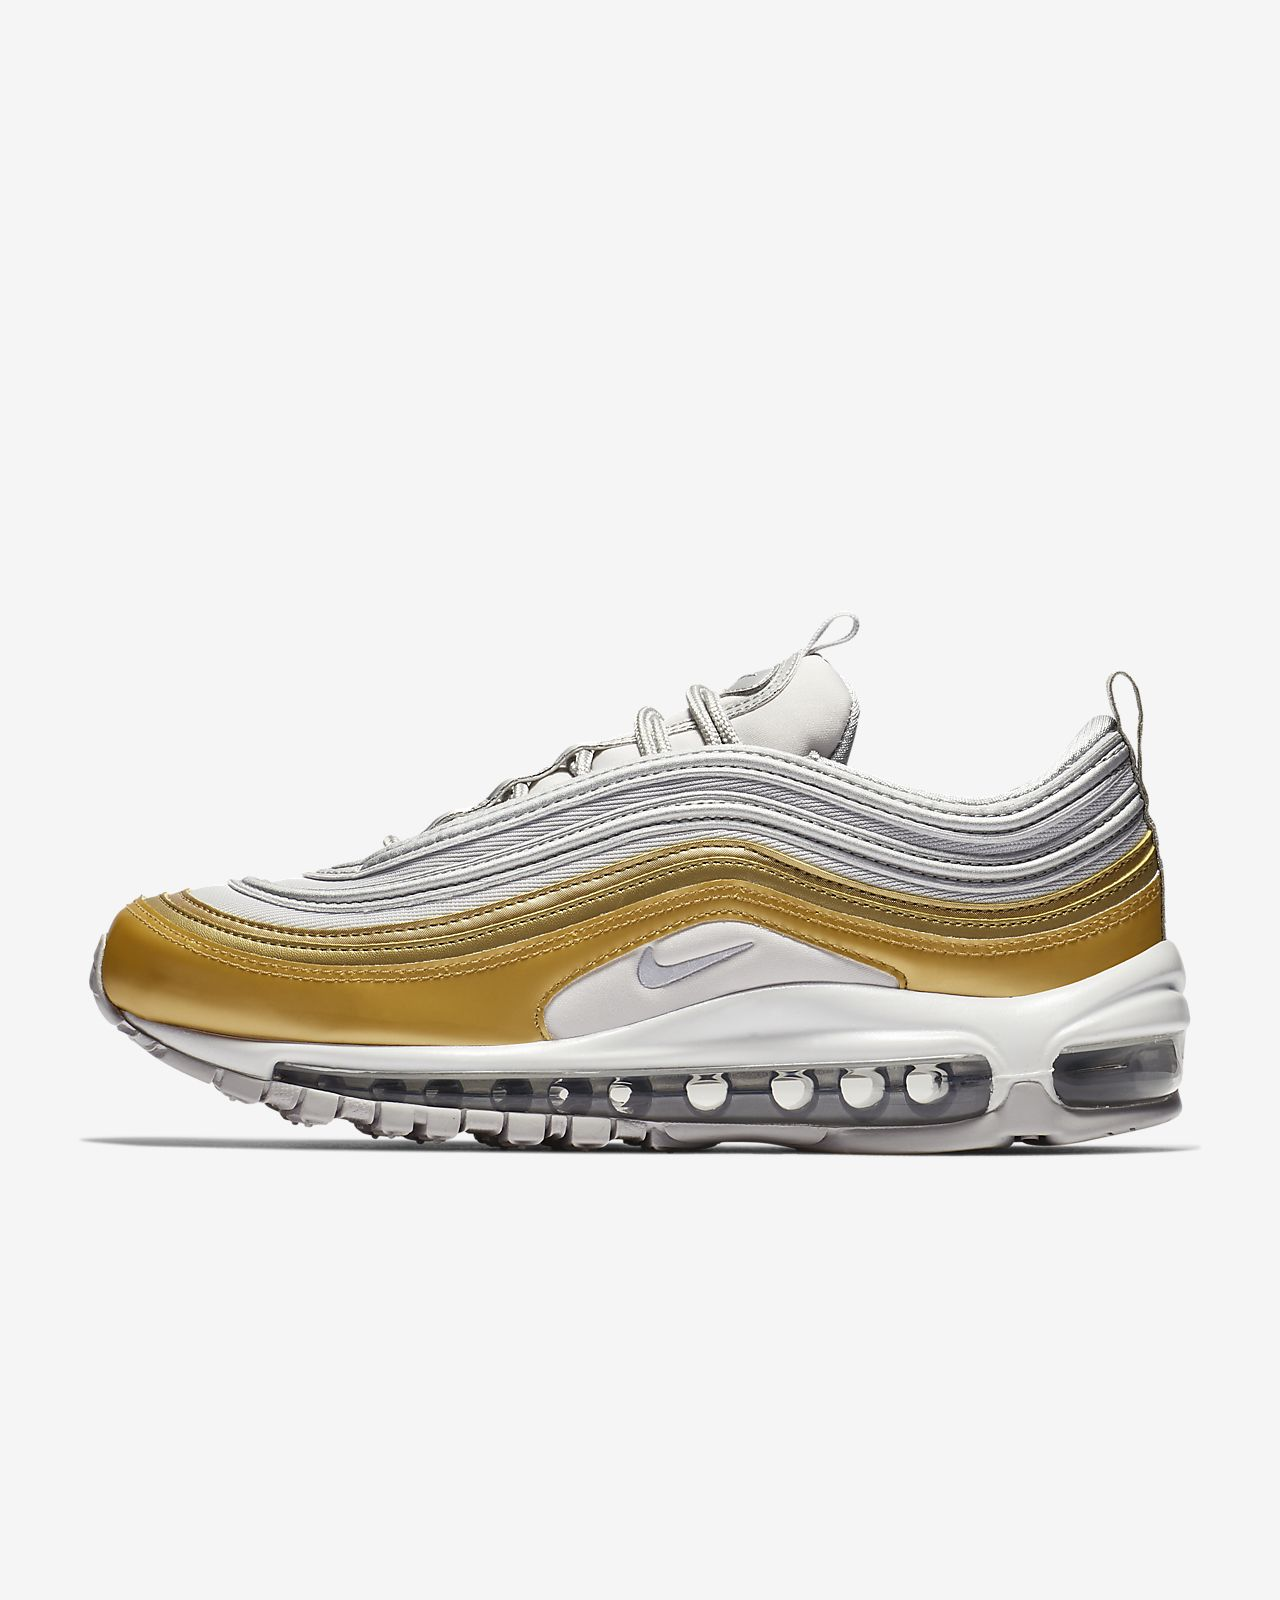 Sko Nike Air Max 97 SE Metallic för kvinnor